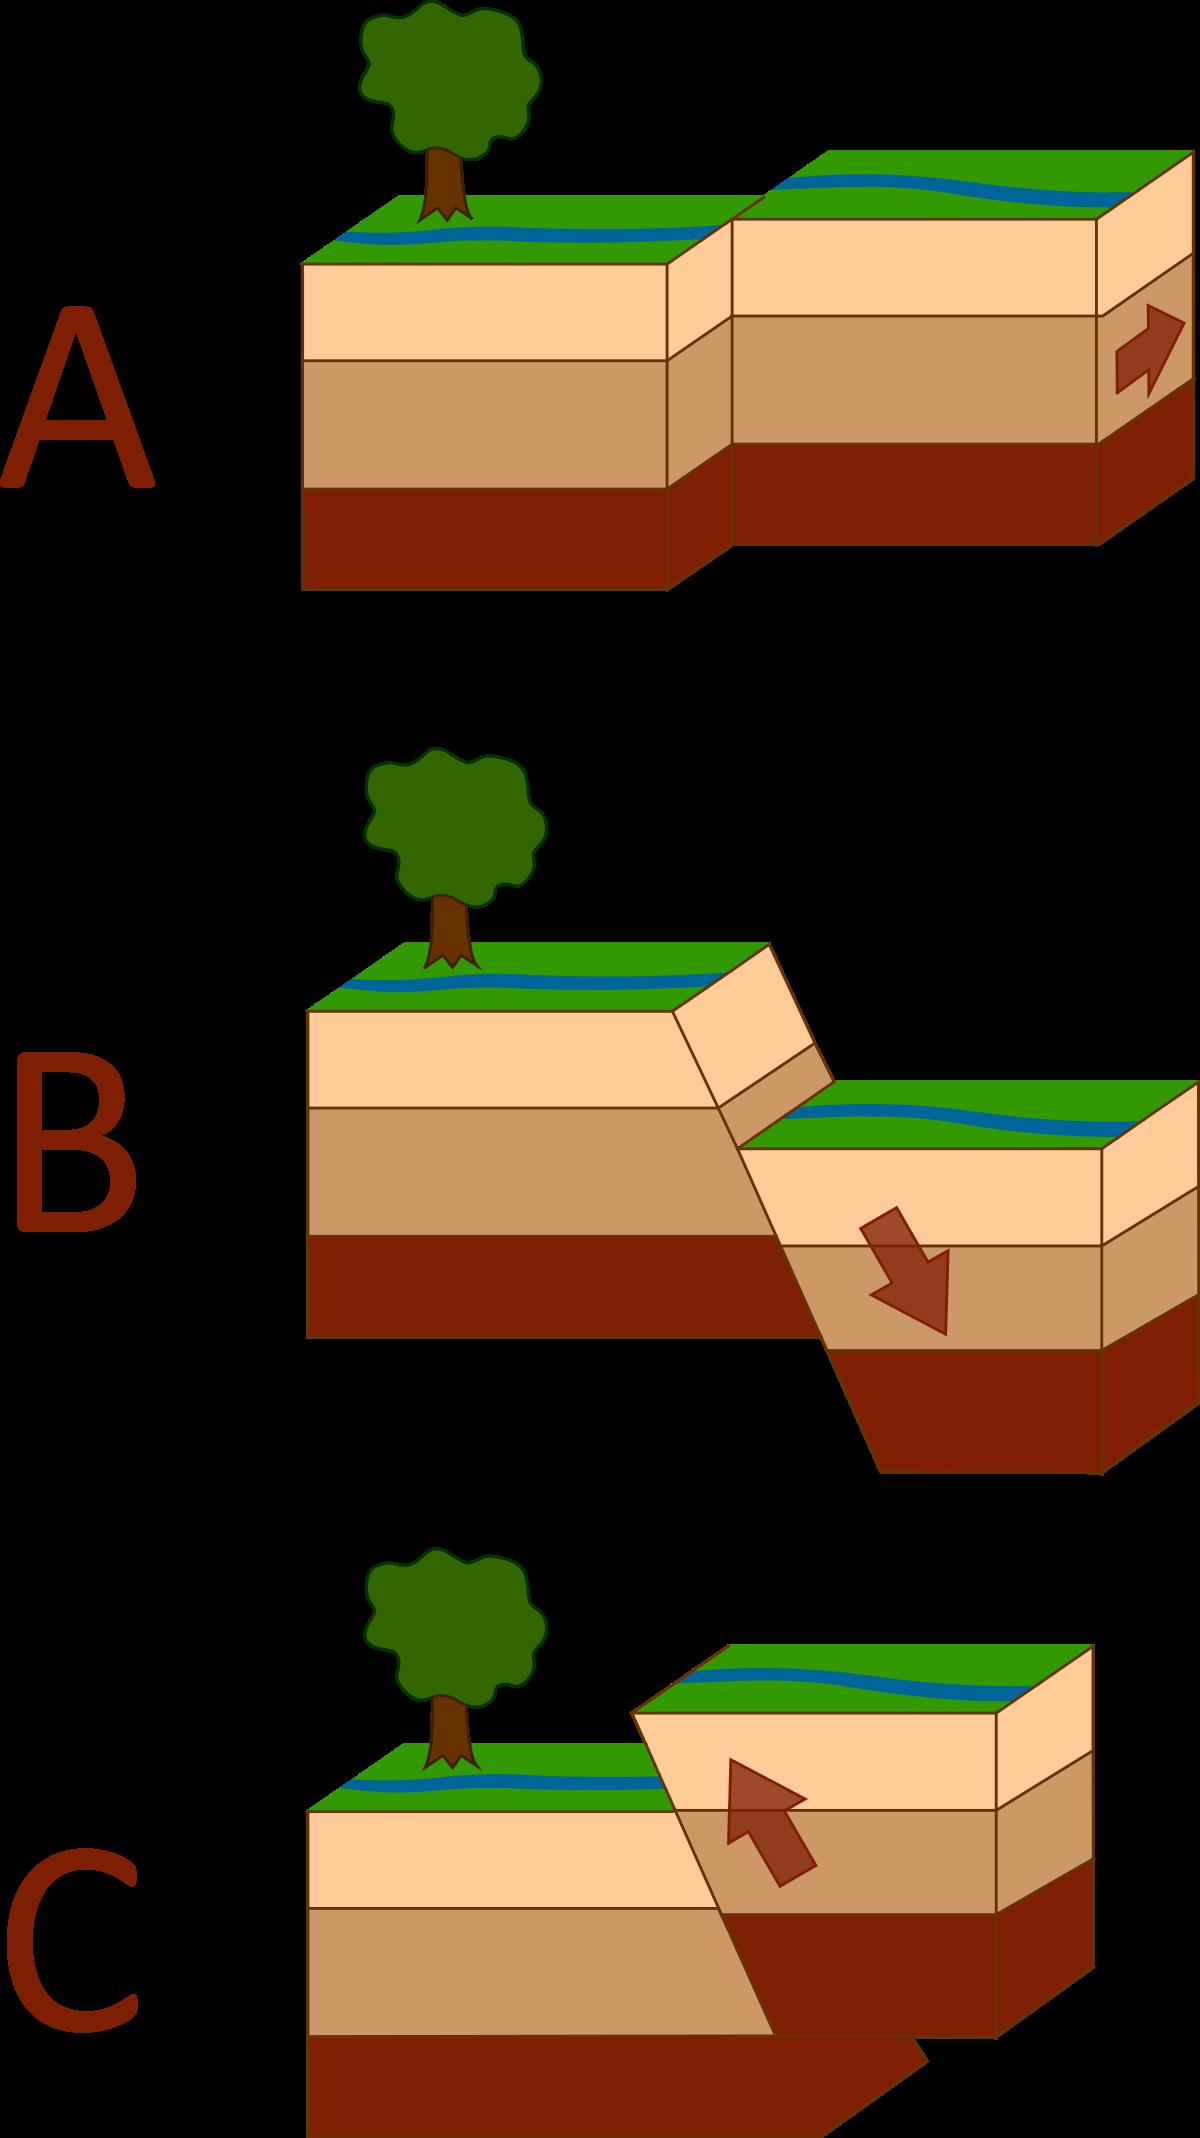 Seismology wiktionary . Earthquake clipart seismologist